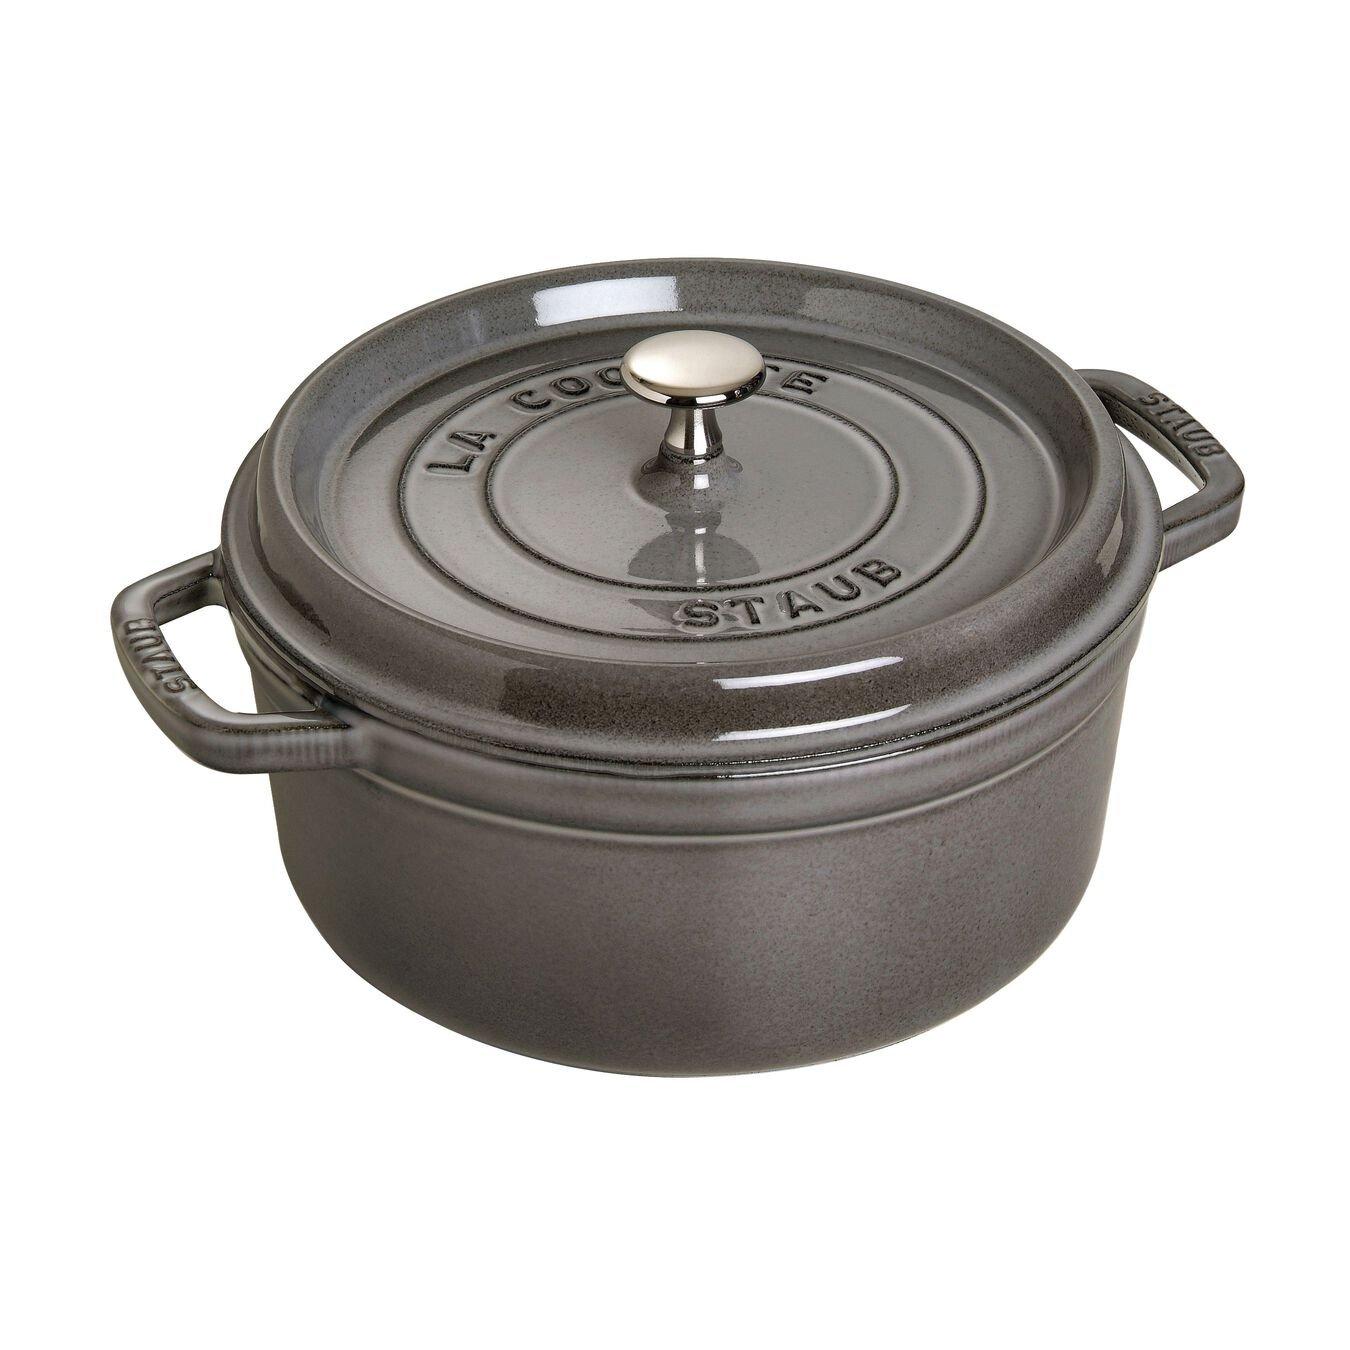 Staub Cast Iron 4-Quart Round Cocotte - Graphite Grey